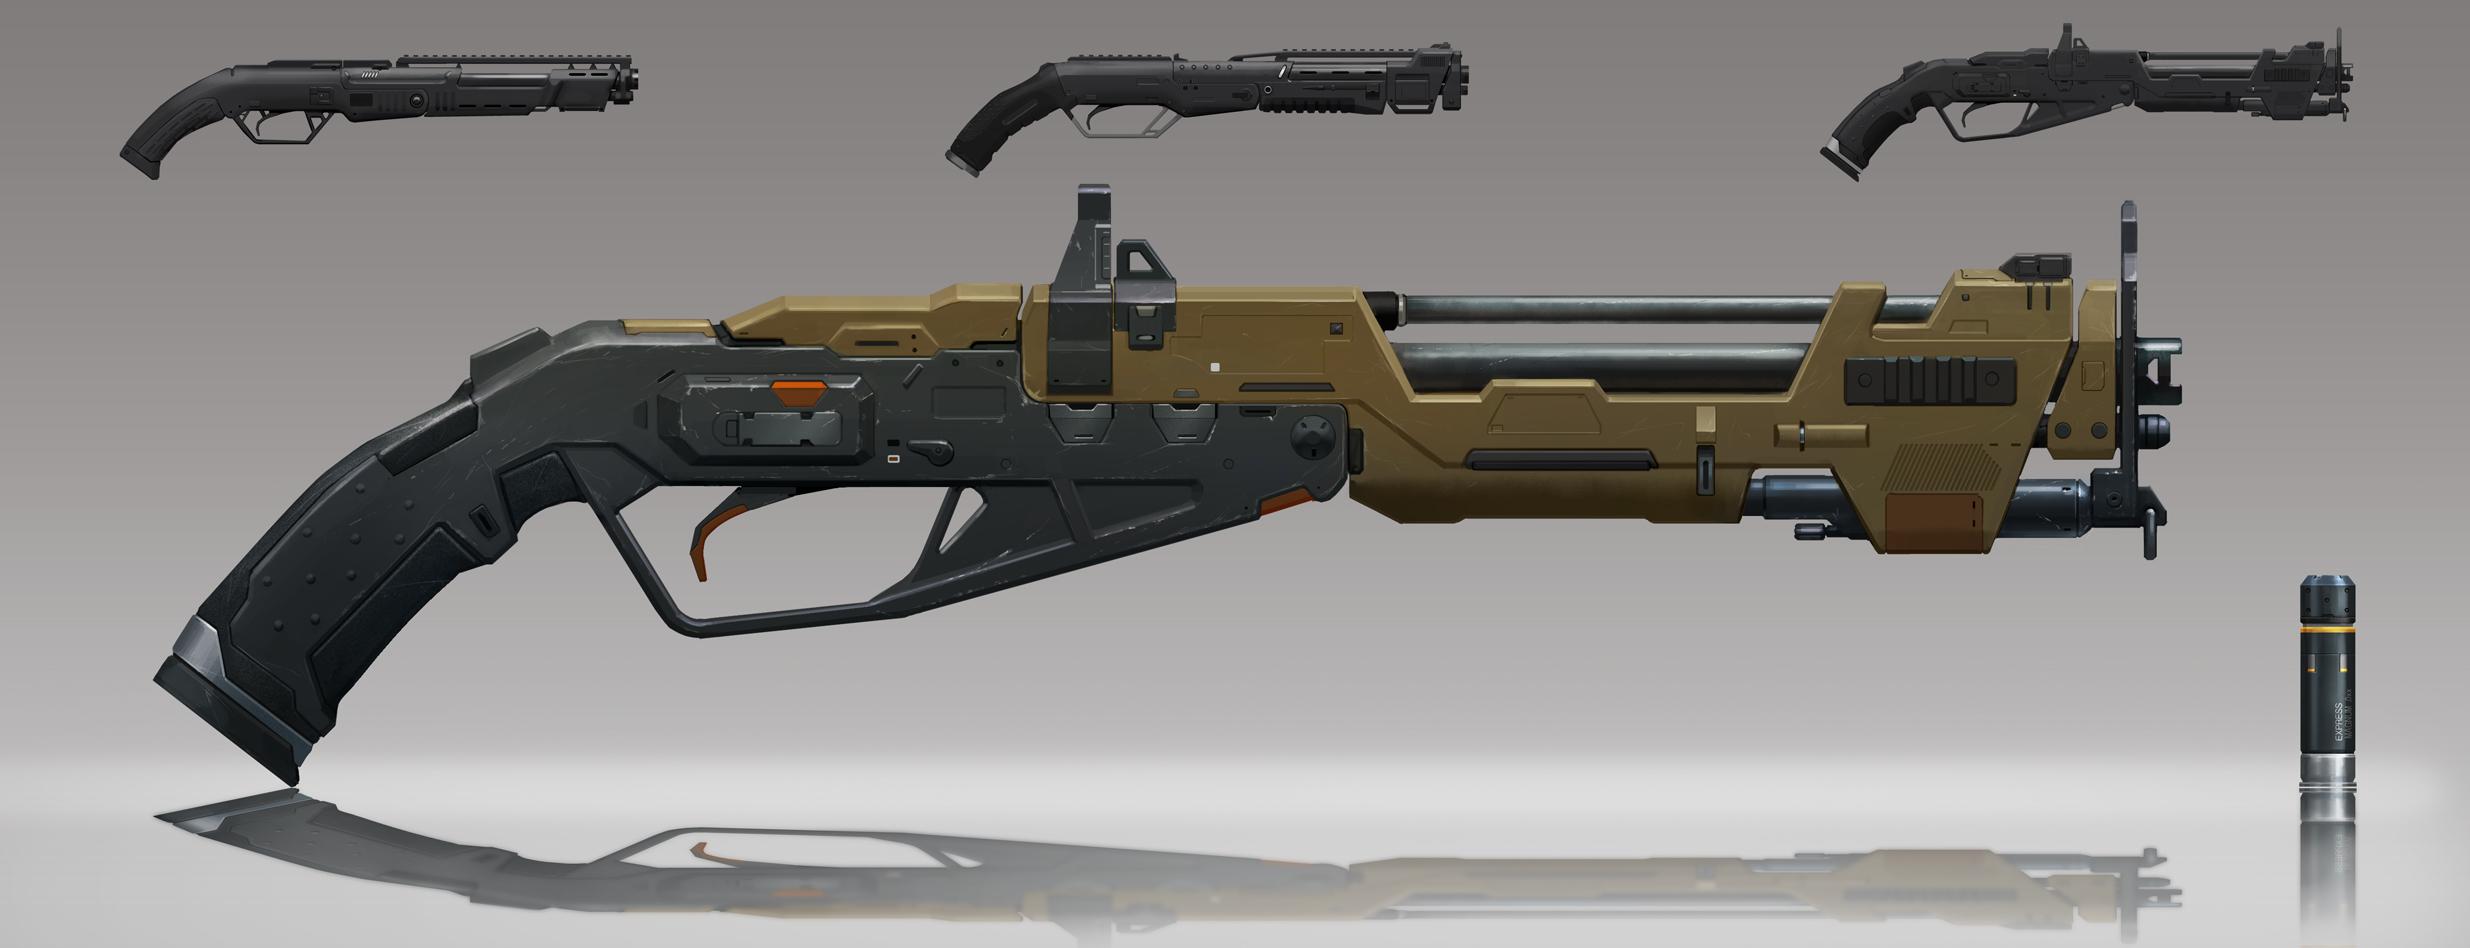 guns02.jpg